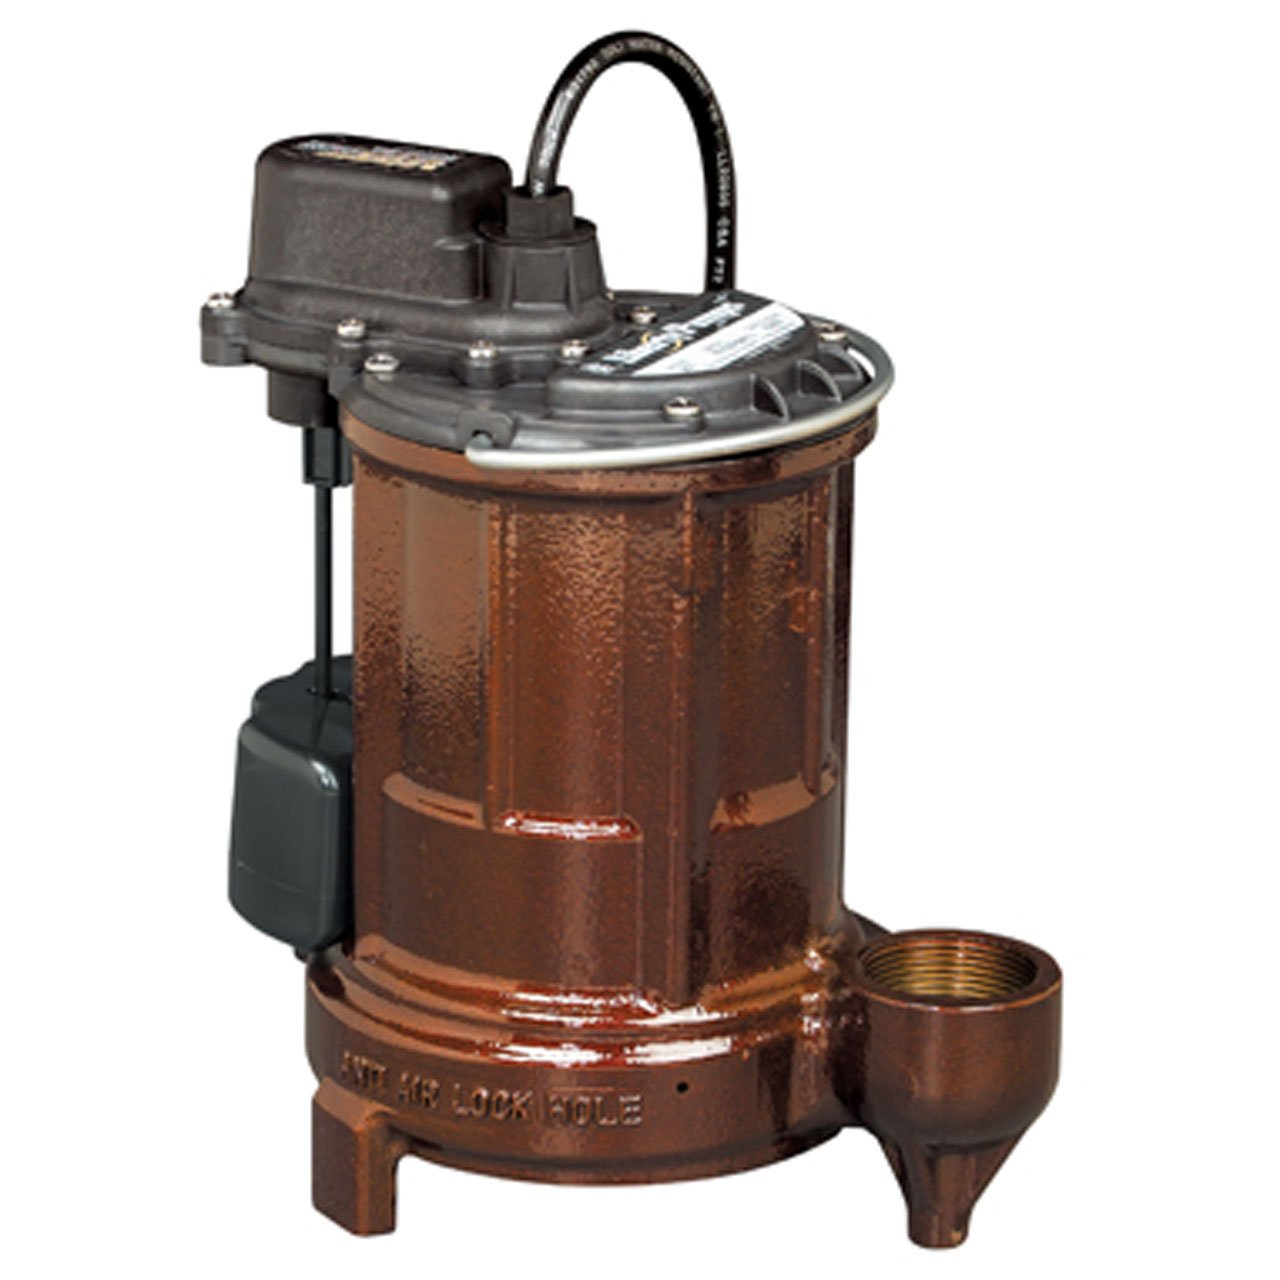 Liberty Pumps 250 Manual 1 3 Hp Cast Iron Submersible Sump